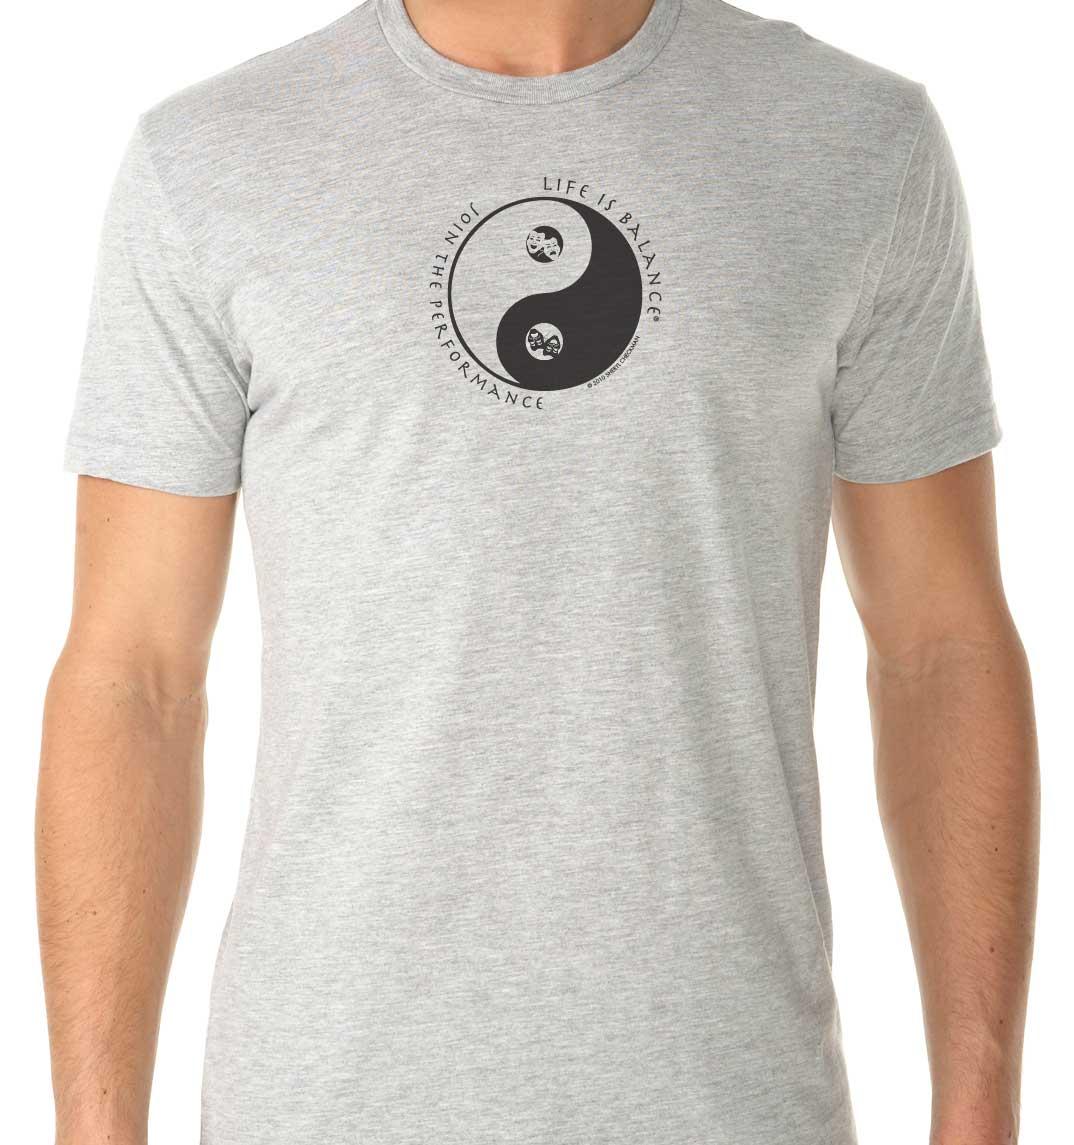 Men's short sleeve theater t-shirt (heather gray/black)